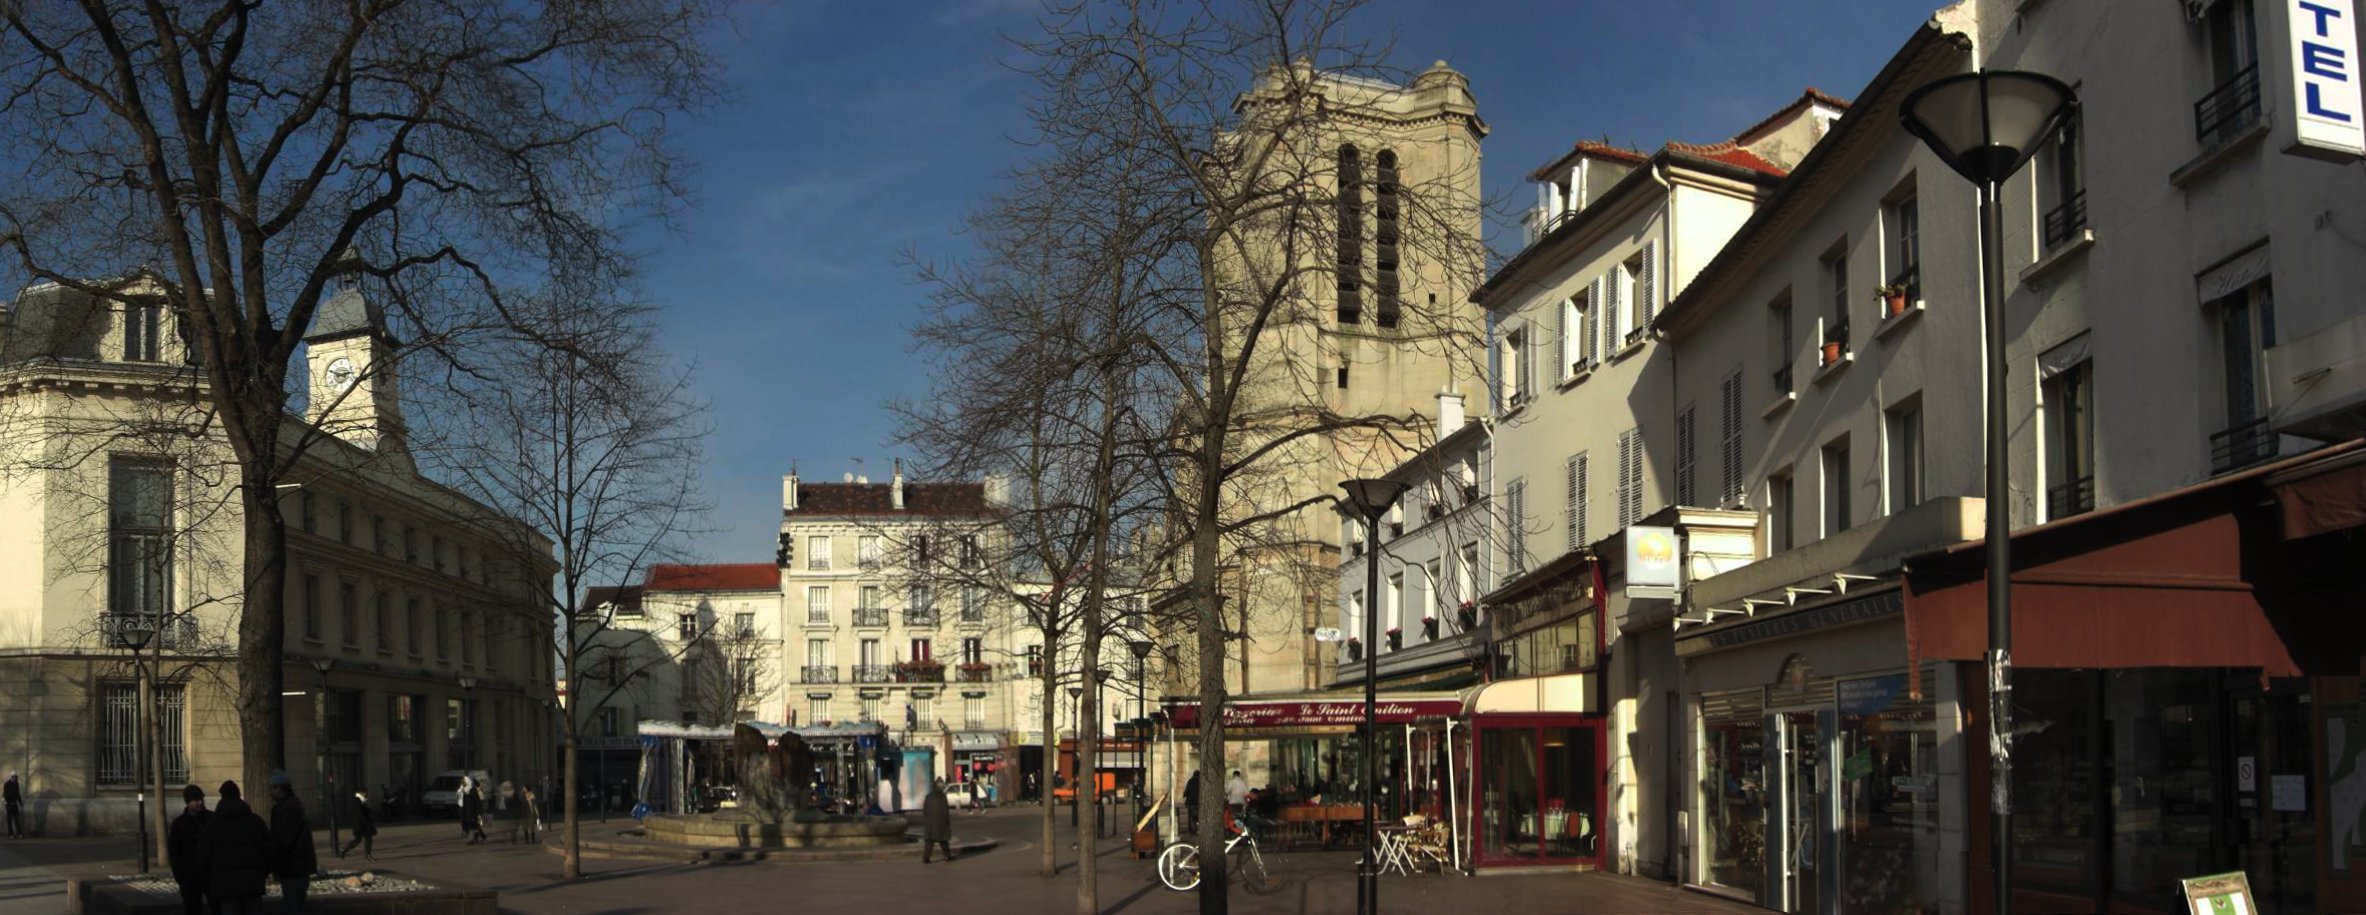 plan k Épinay-sur-Seine